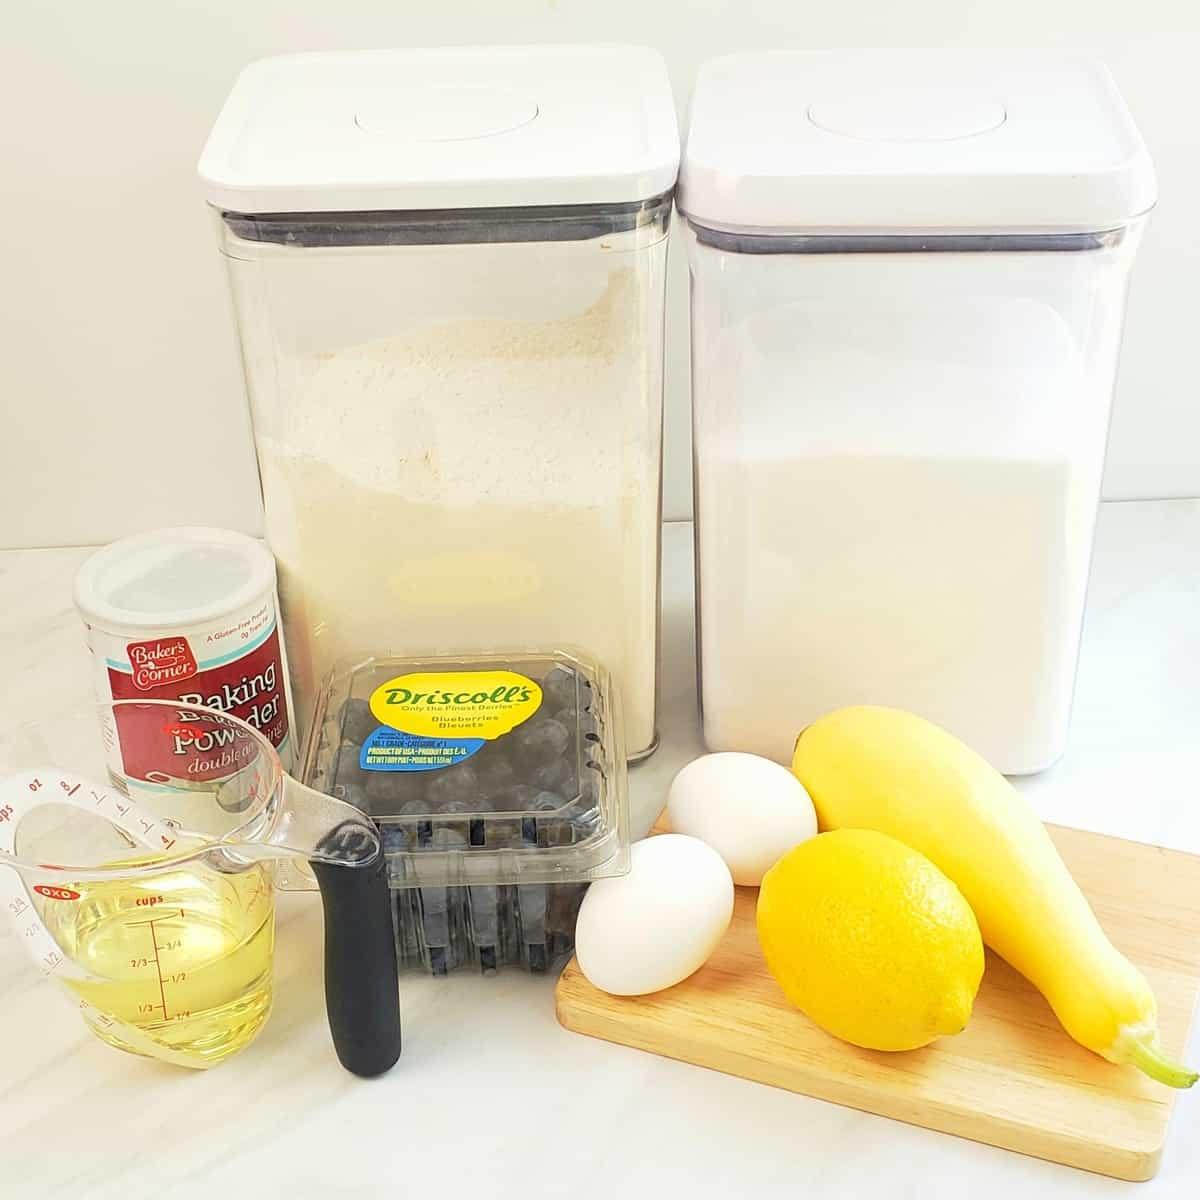 ingredients: flour, sugar, eggs, baking powder, blueberries, lemon, yellow squash, oil